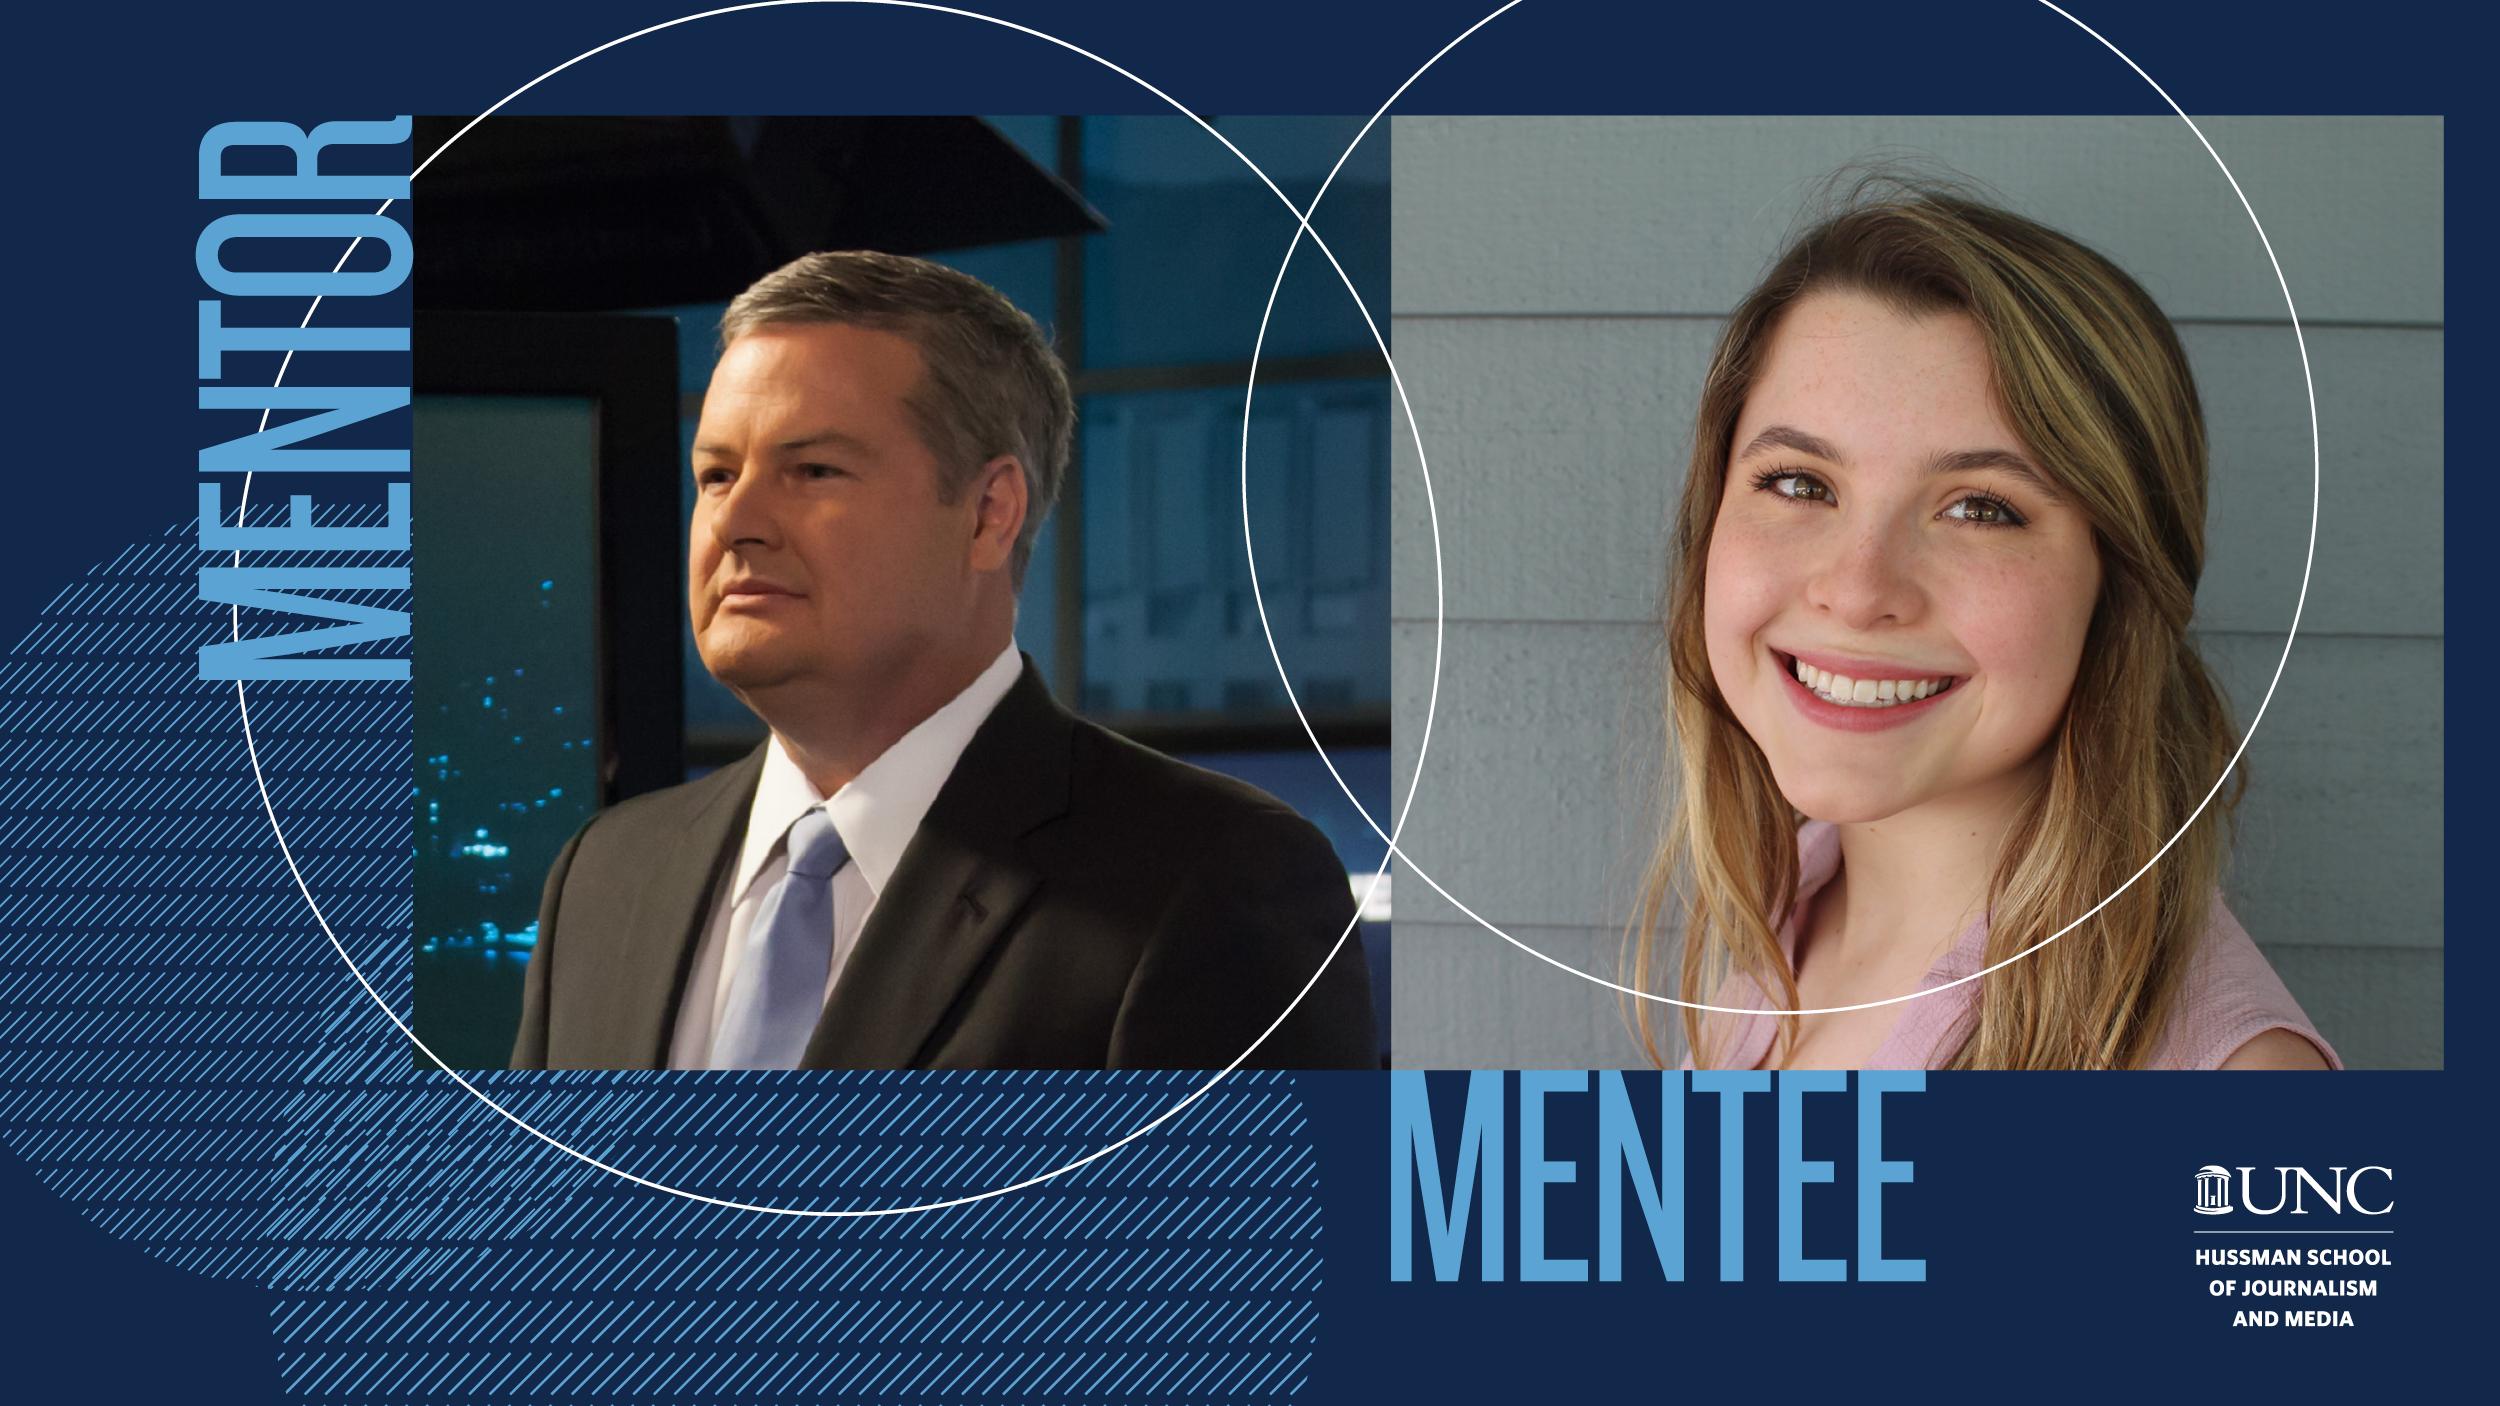 Mentor/mentee pairing Stephen Stock/Sarah Gray Barr